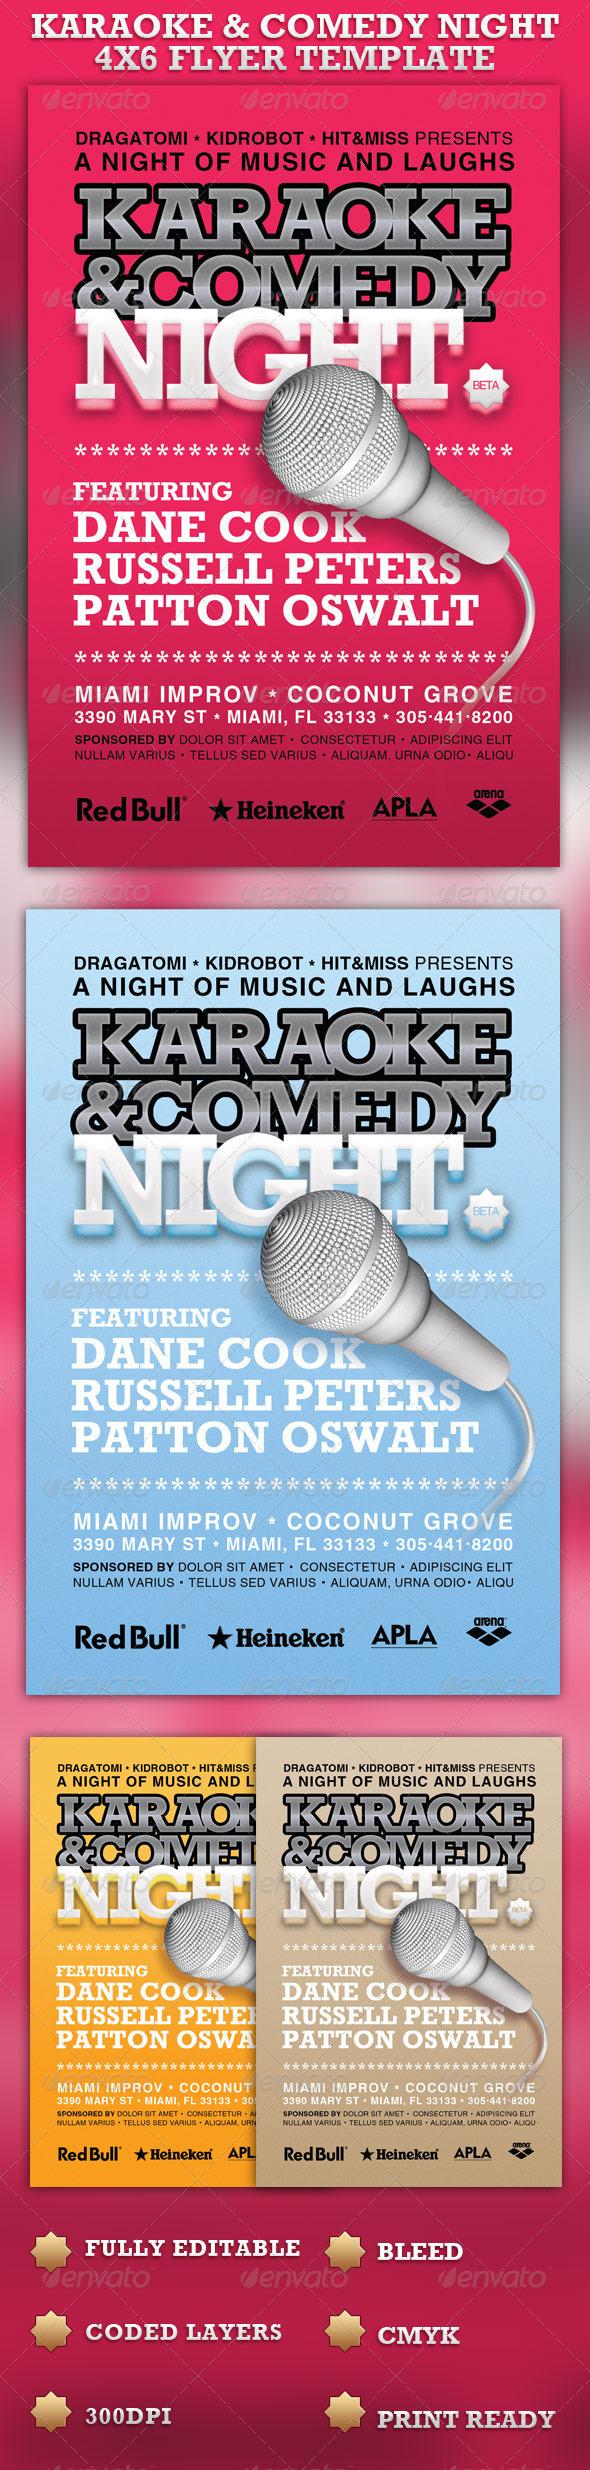 karaoke comedy night 4x6 flyer template 6 00 event flyer